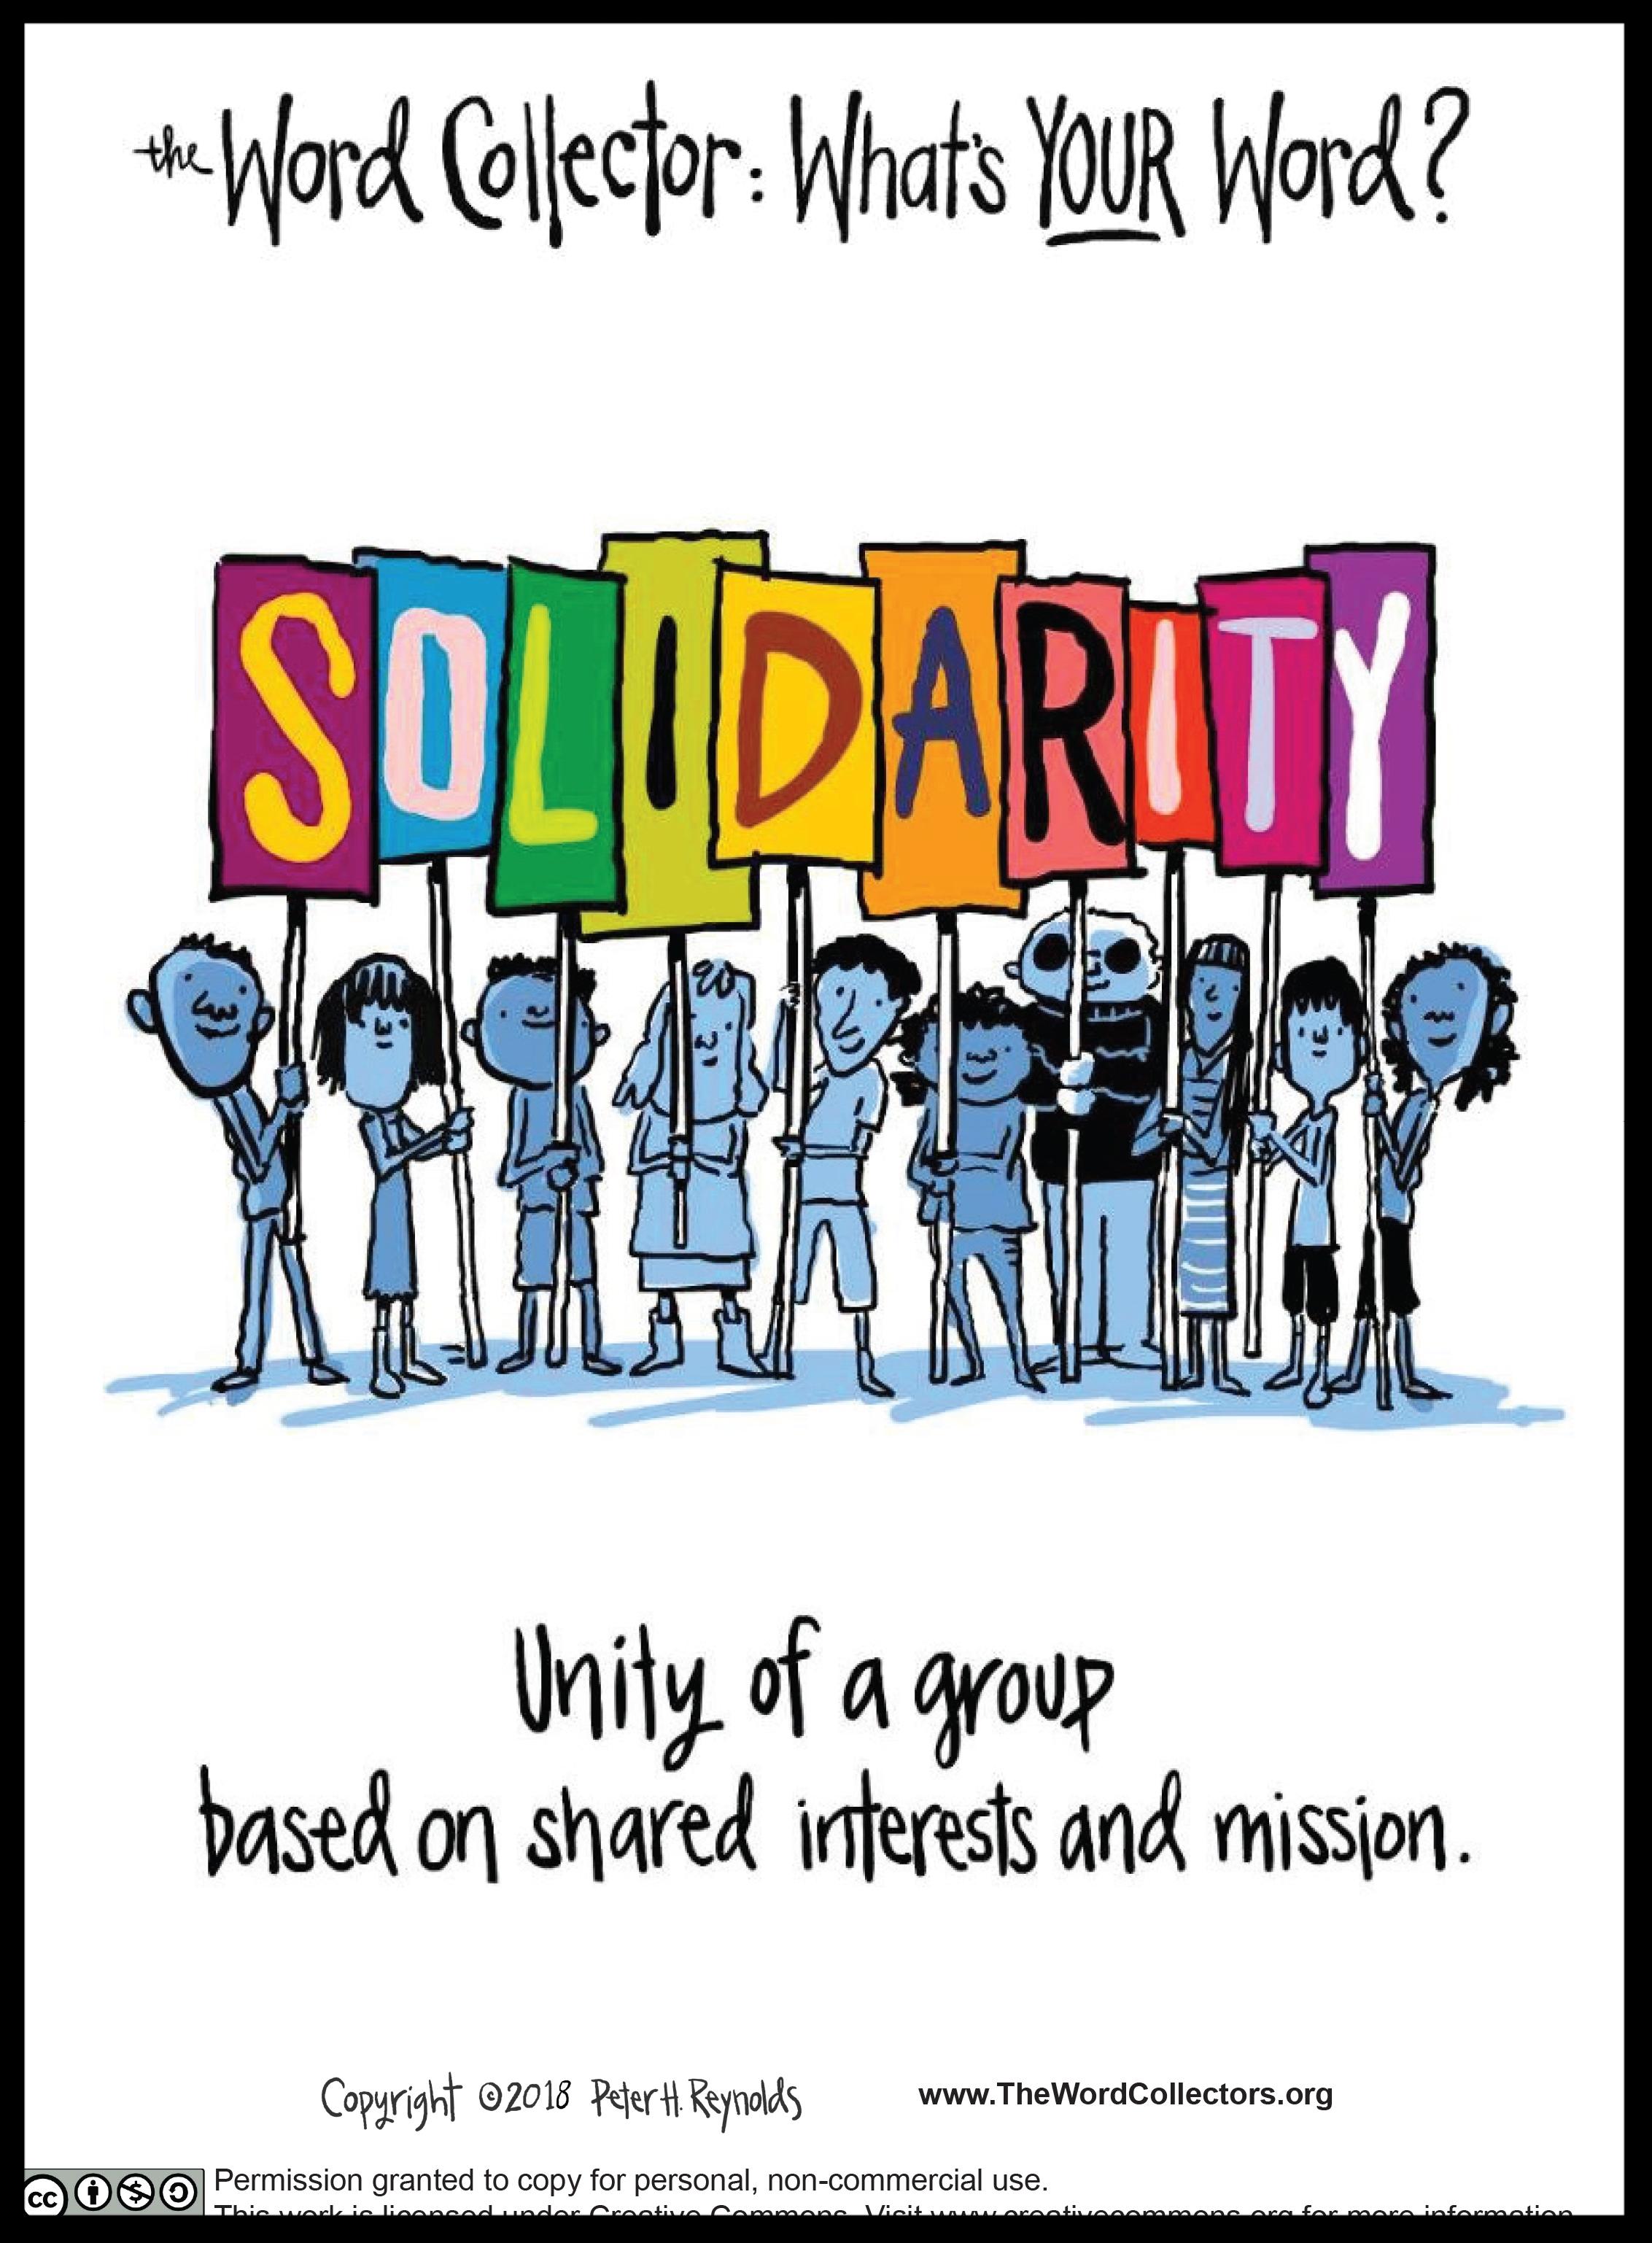 WorCollectorPoster_Solidarity.jpg